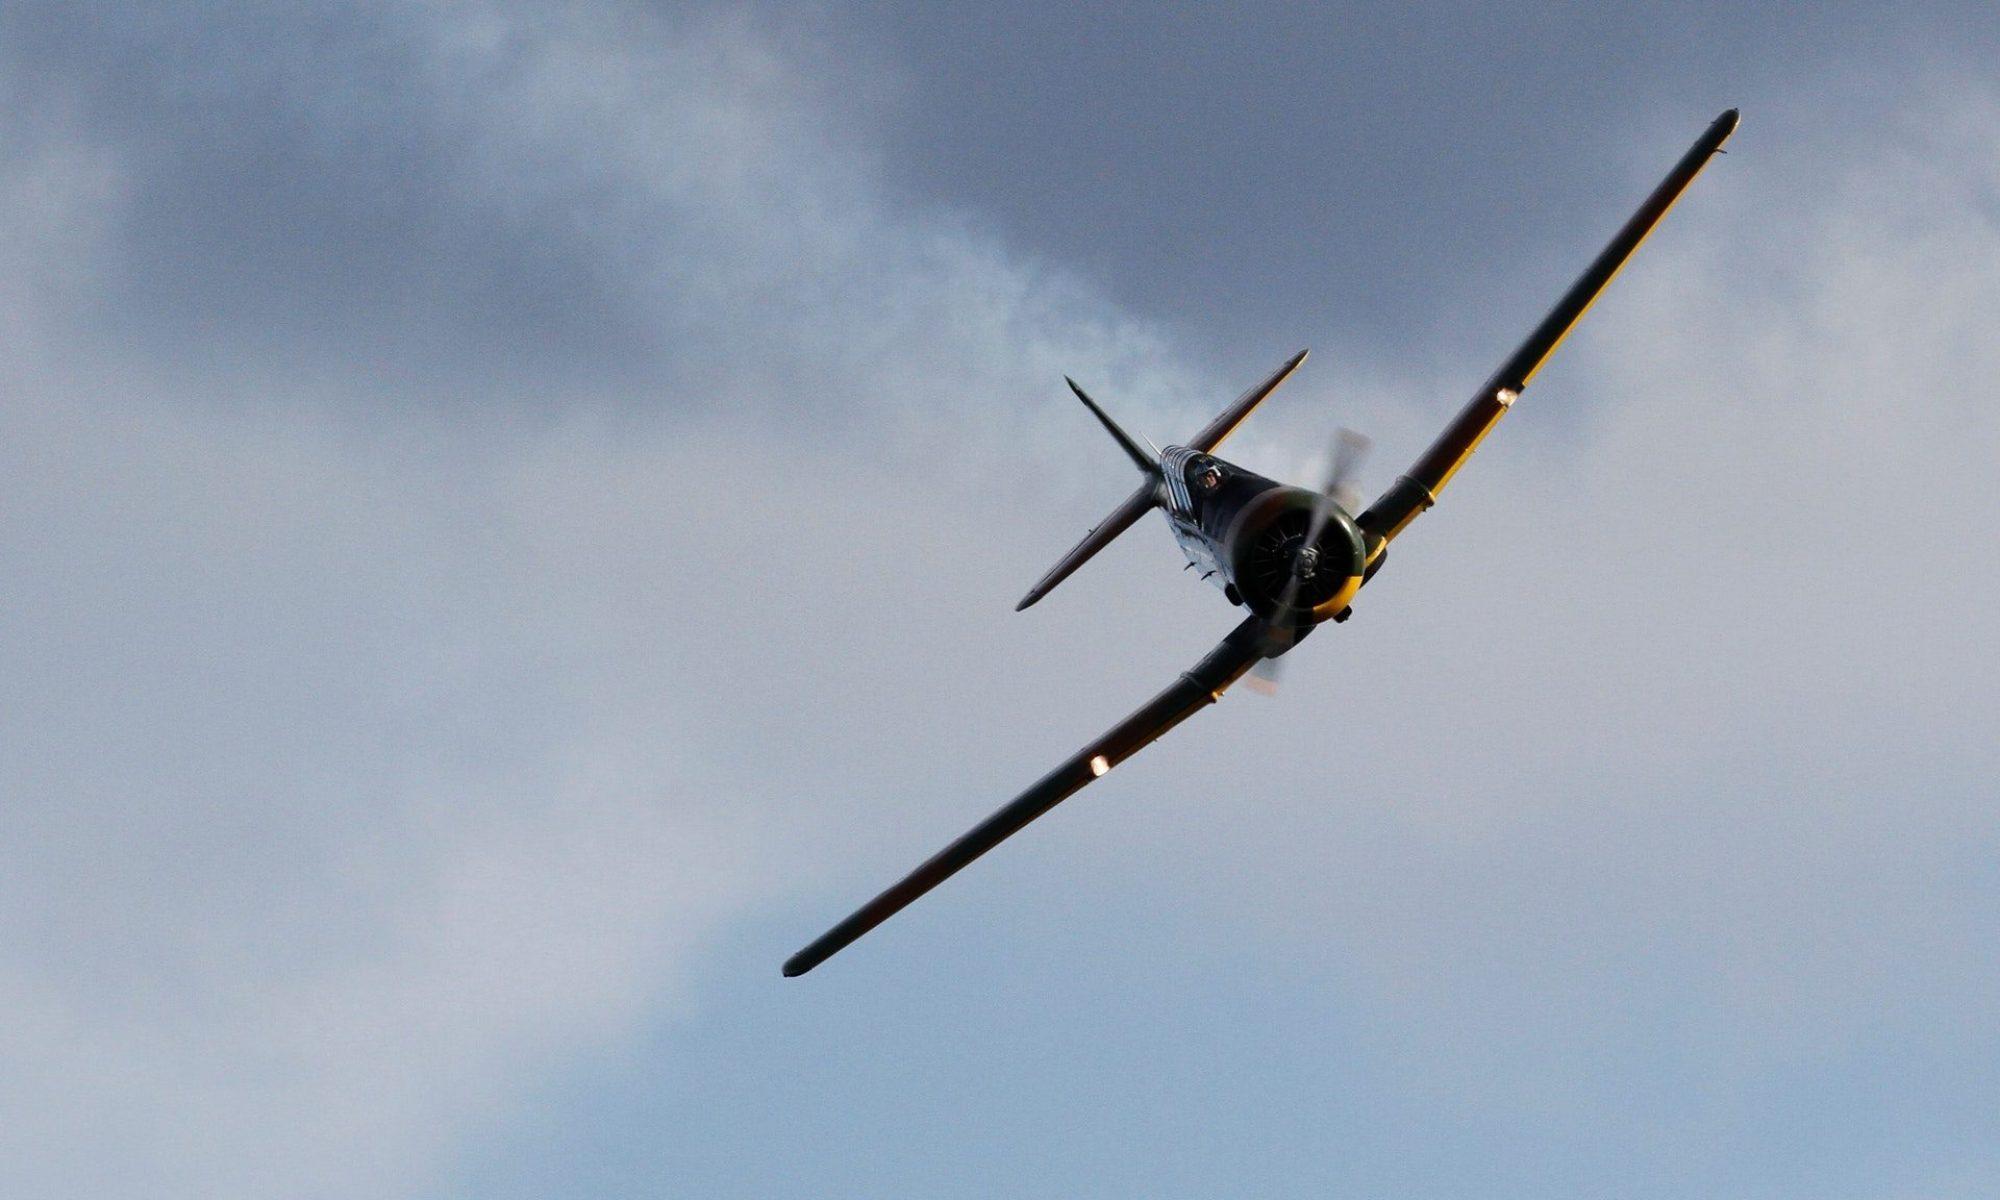 Ace Aircraft Refinishing